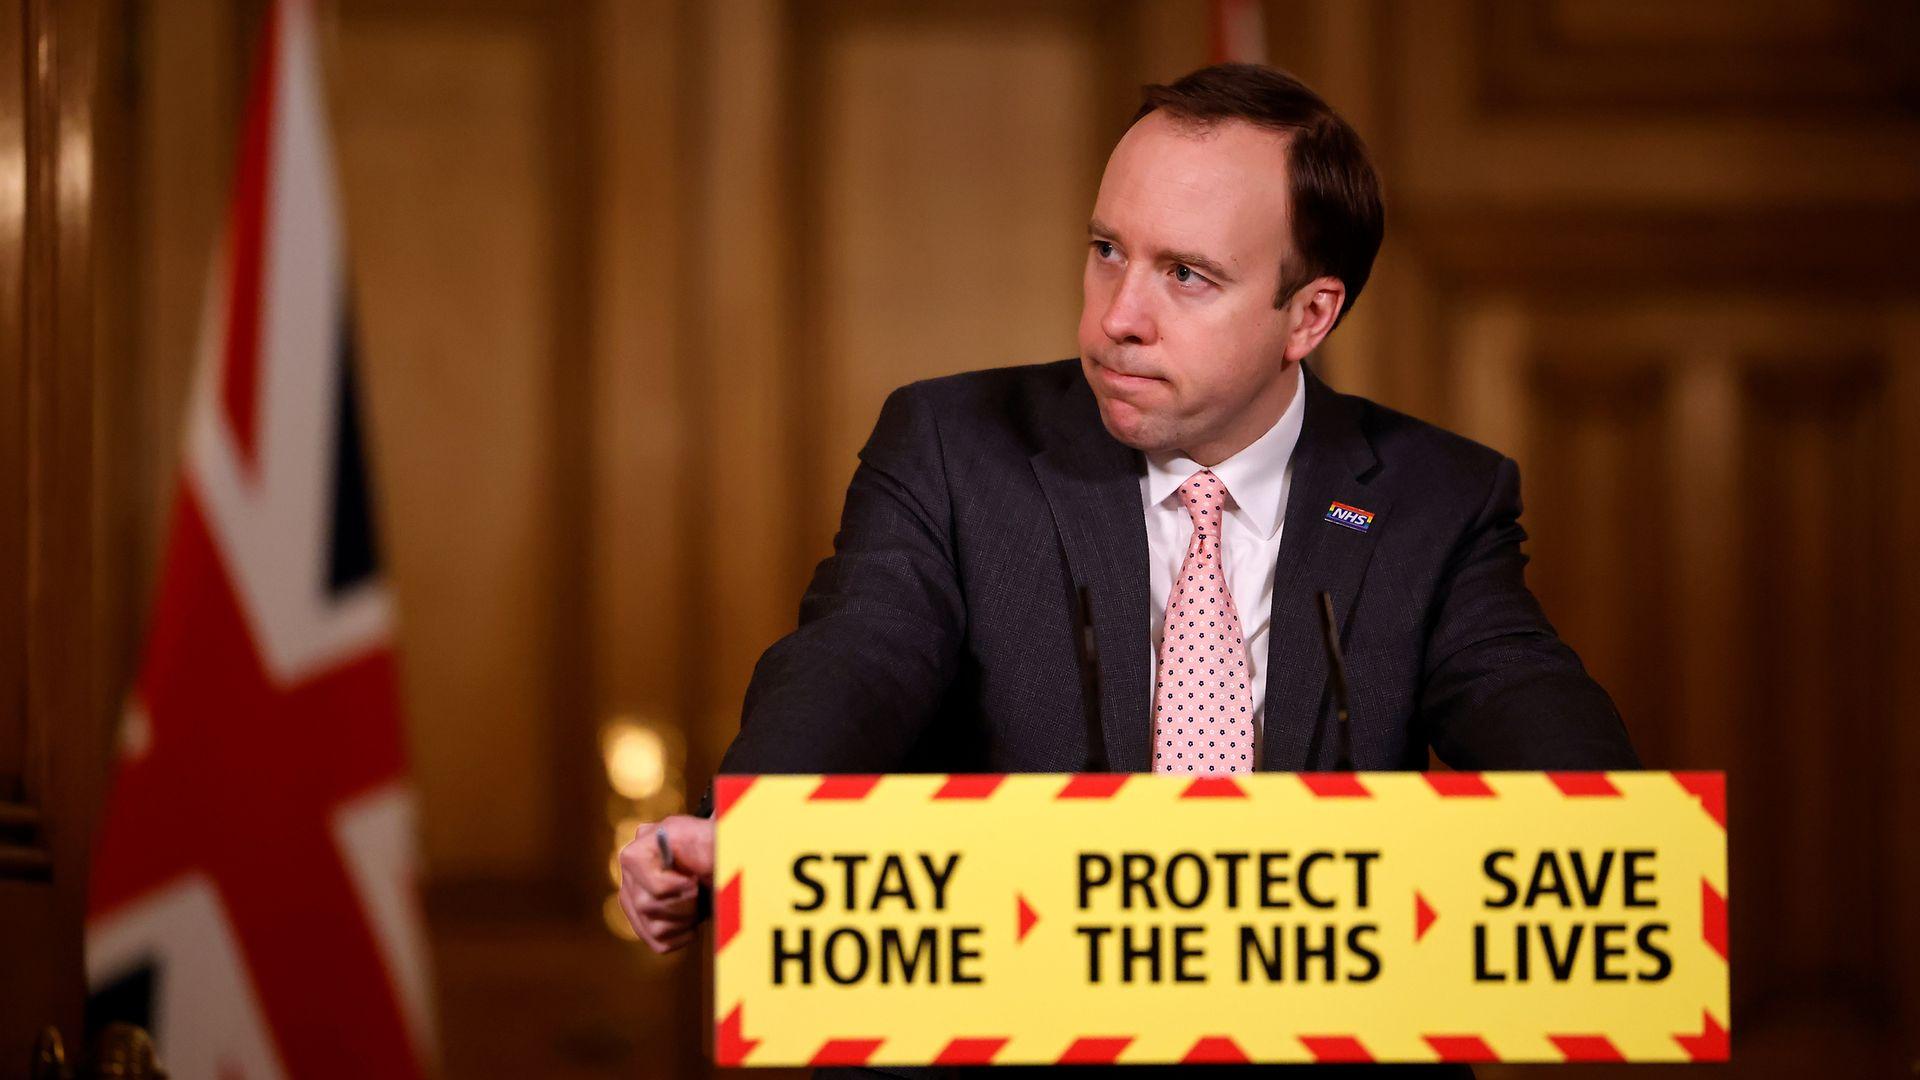 Health secretary Matt Hancock during a media briefing in Downing Street - Credit: PA